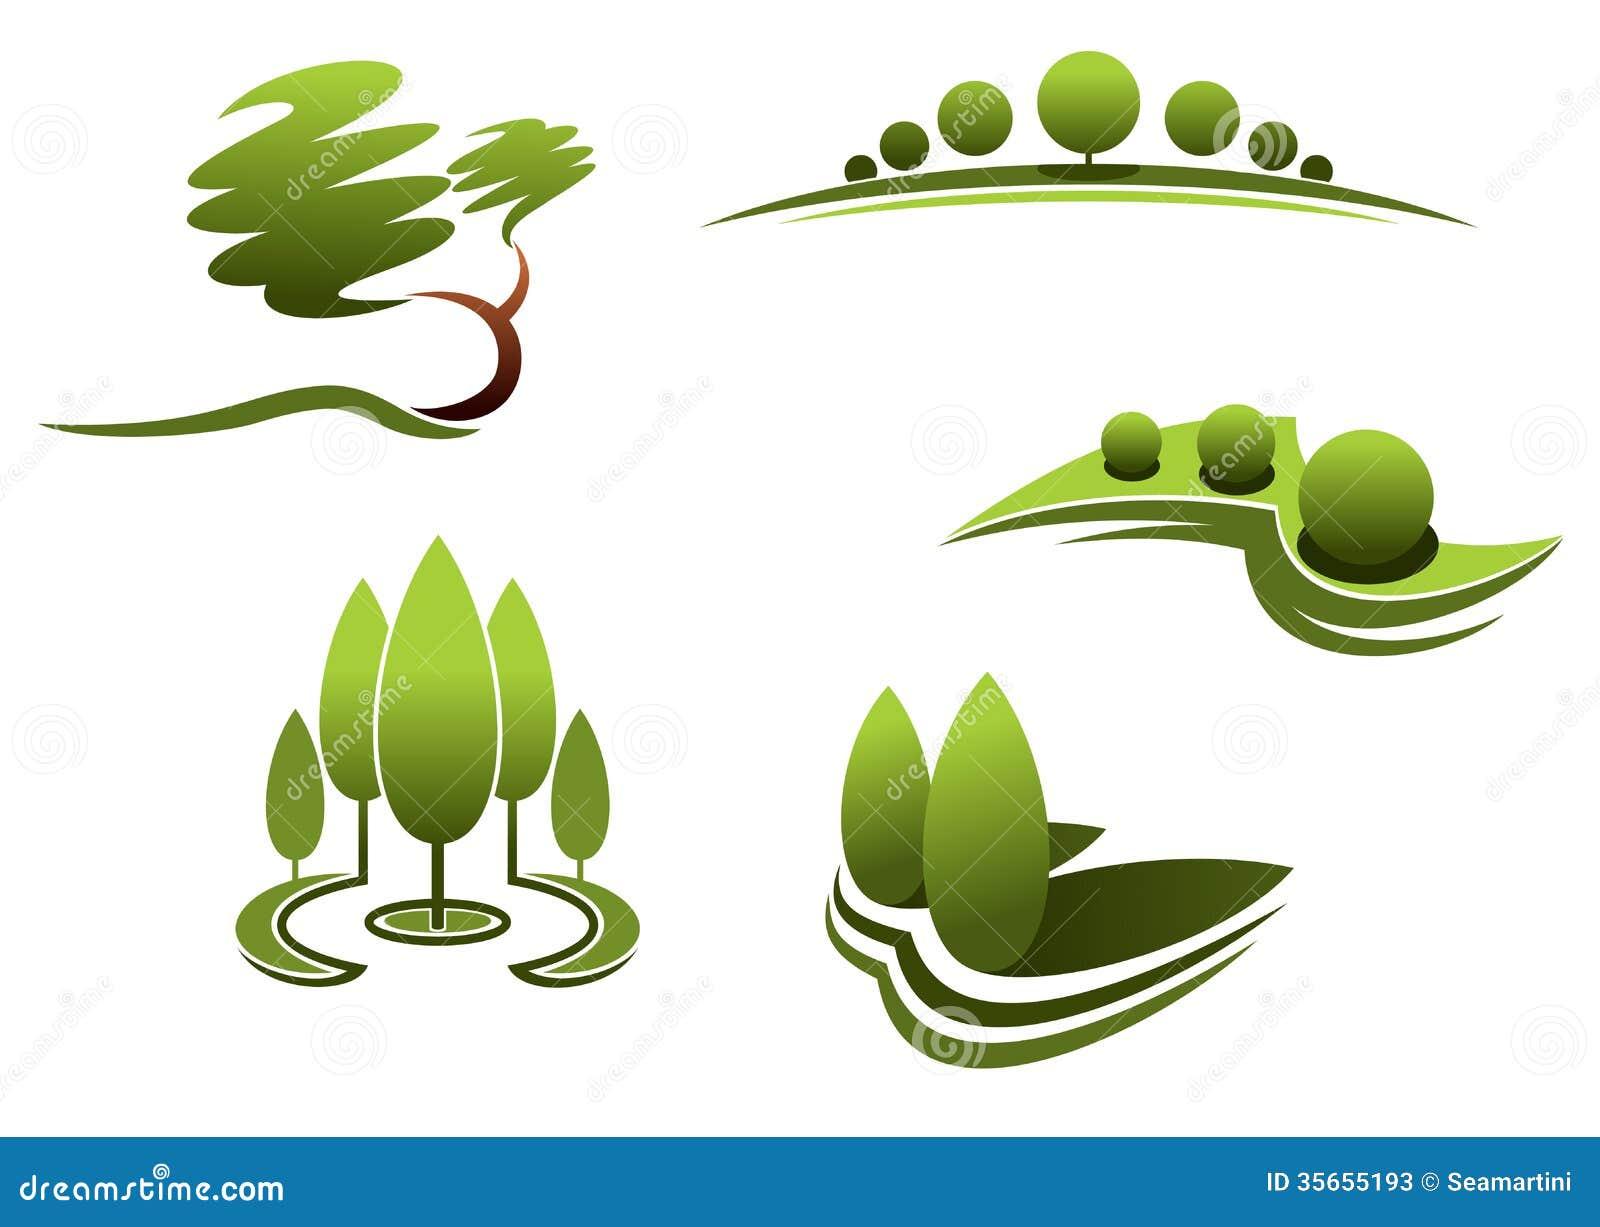 Landscape design elements stock photos image 35655193 for Garden design elements